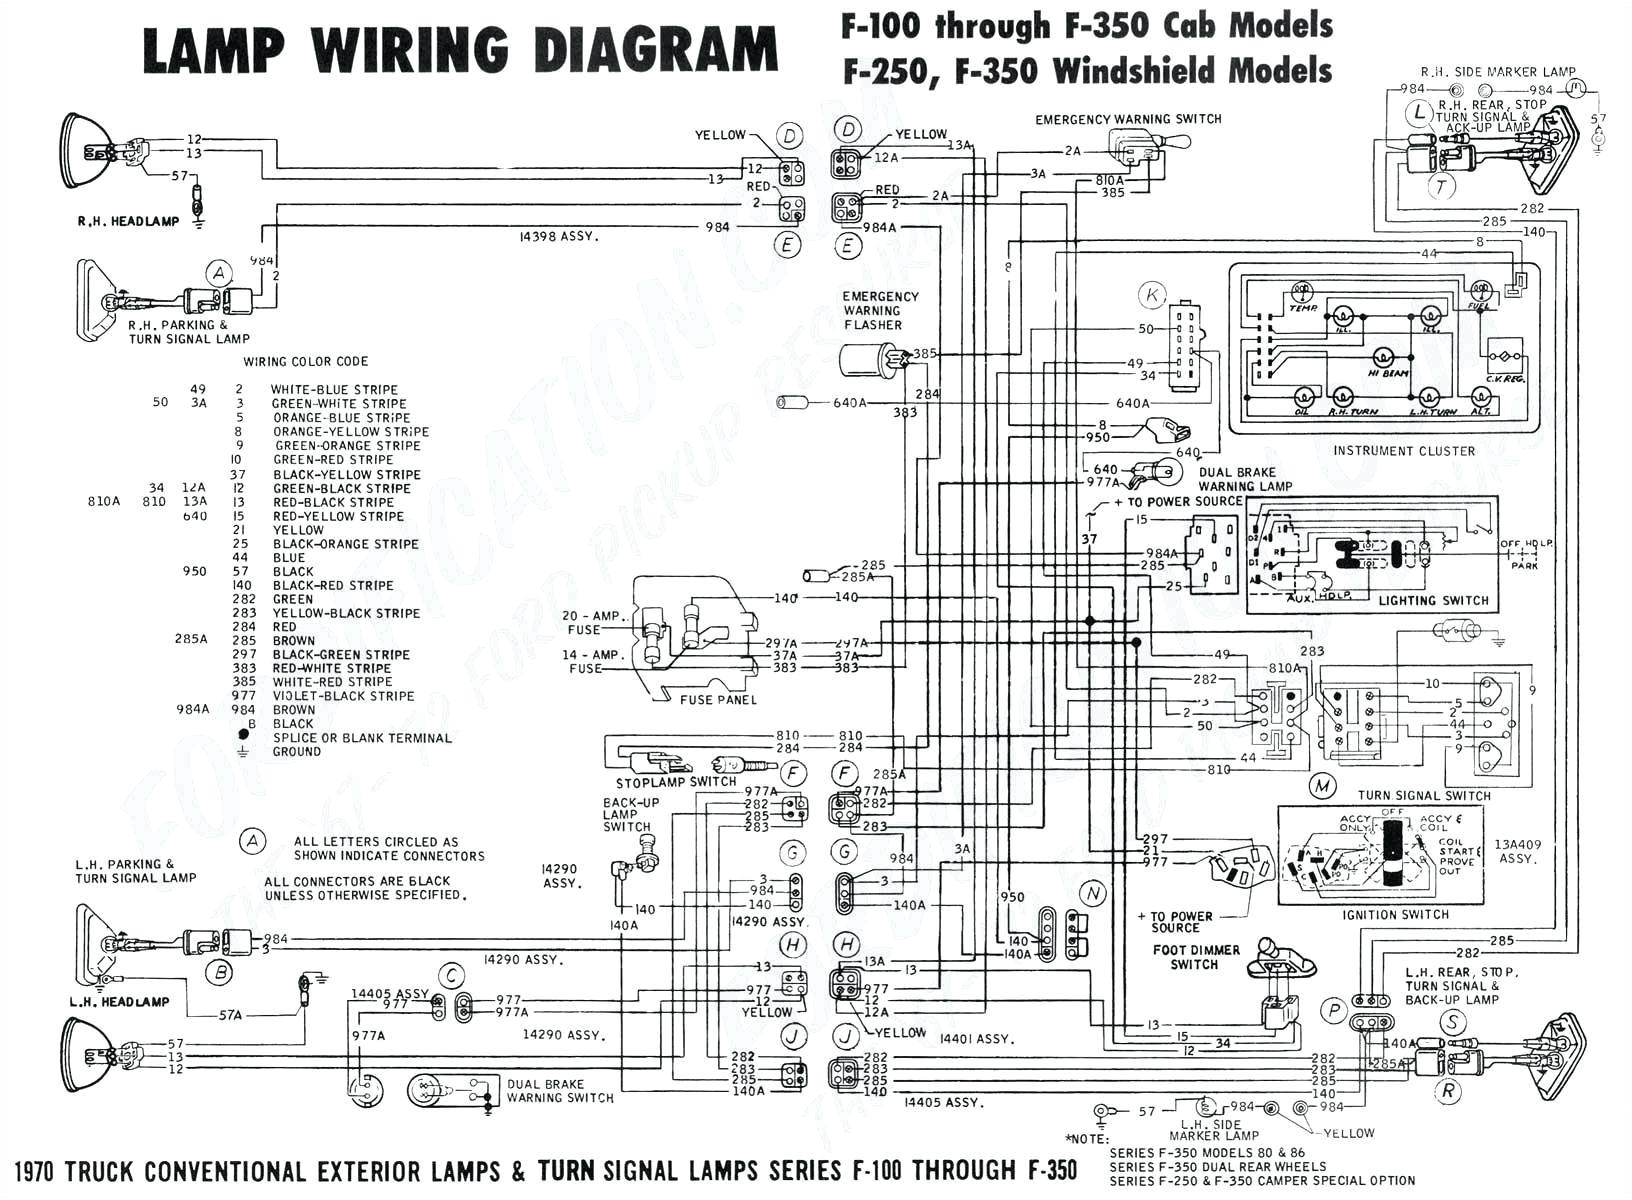 electronic bell circuit diagram tradeoficcom wiring diagram ame electronic circuit breaker circuit diagram tradeoficcom